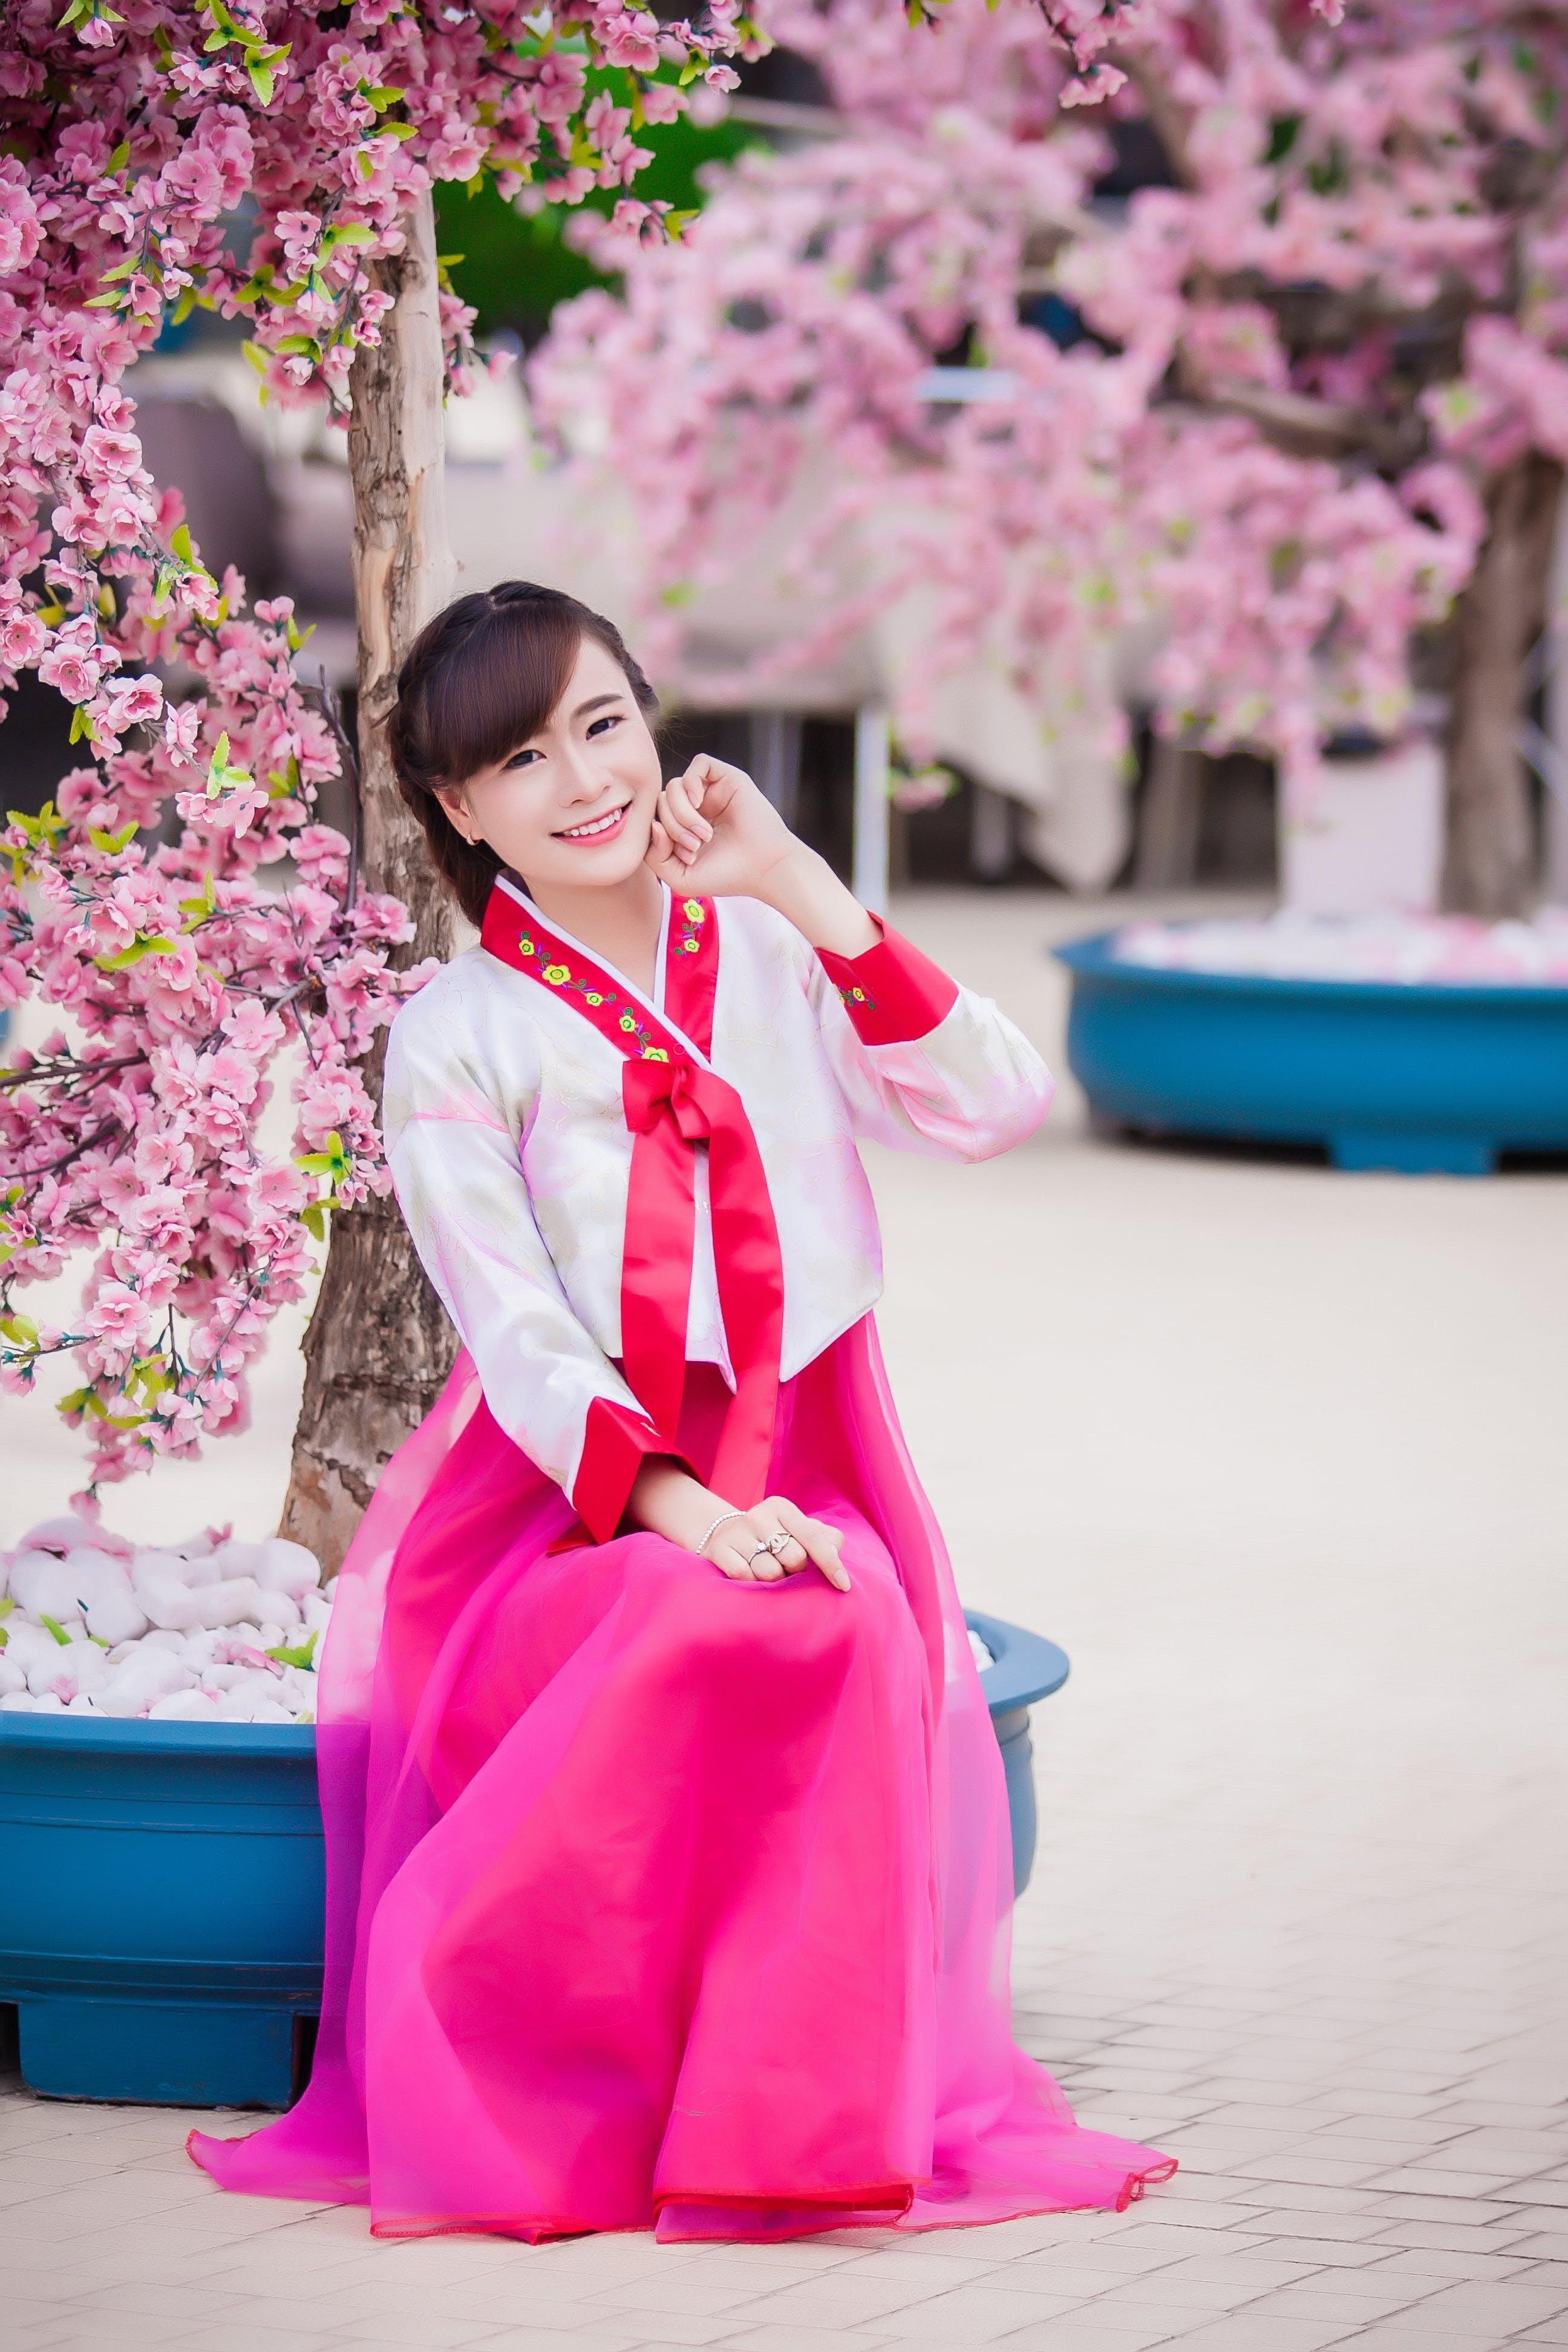 Fotos de stock gratuitas de bonita, bonito, flores, mono